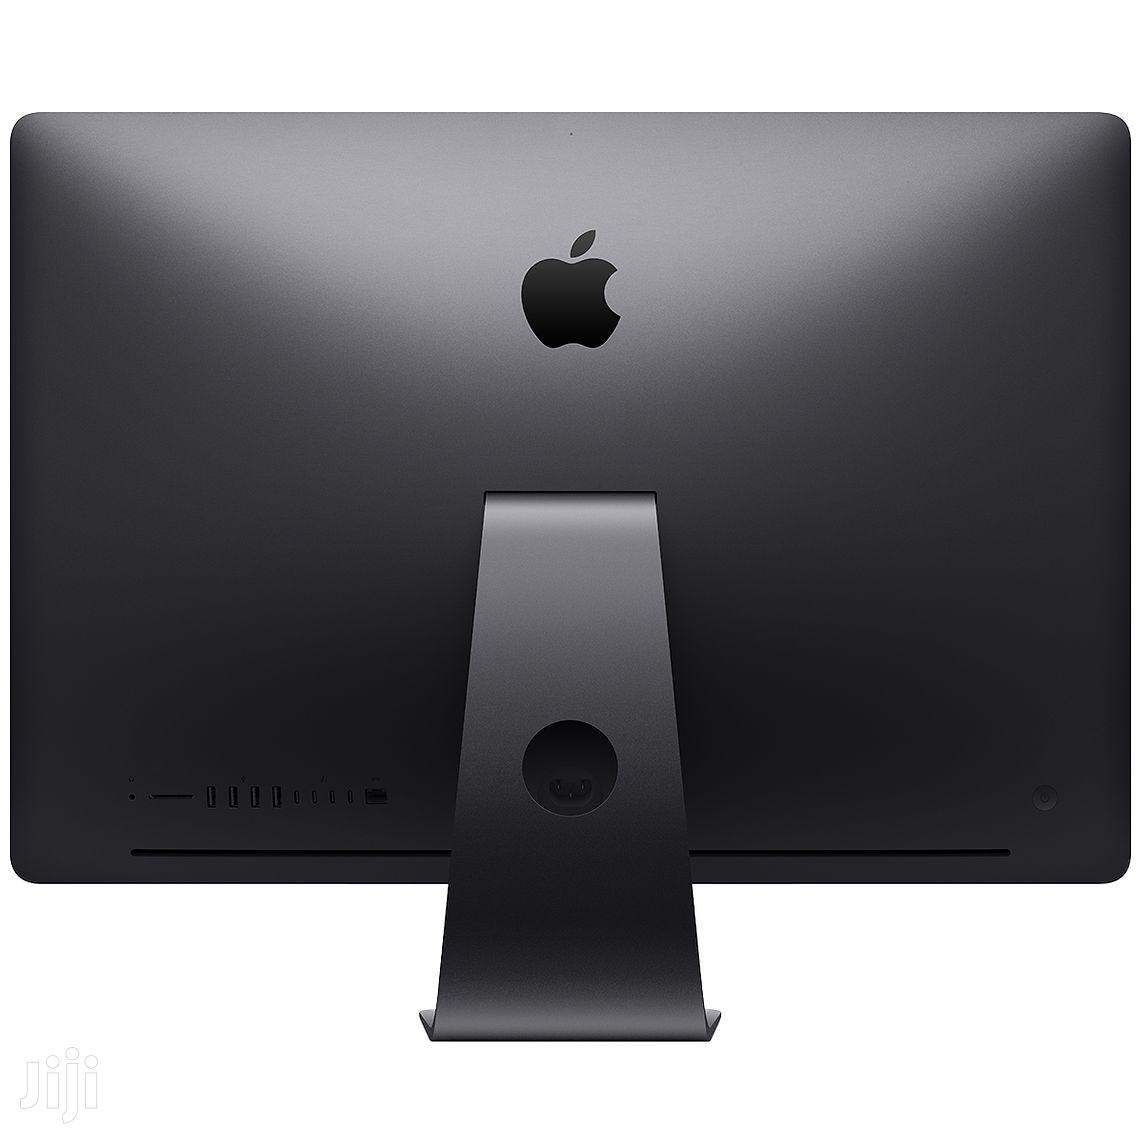 New Desktop Computer Apple iMac Pro 32GB Intel Xeon SSD 1T | Laptops & Computers for sale in Darkuman, Greater Accra, Ghana